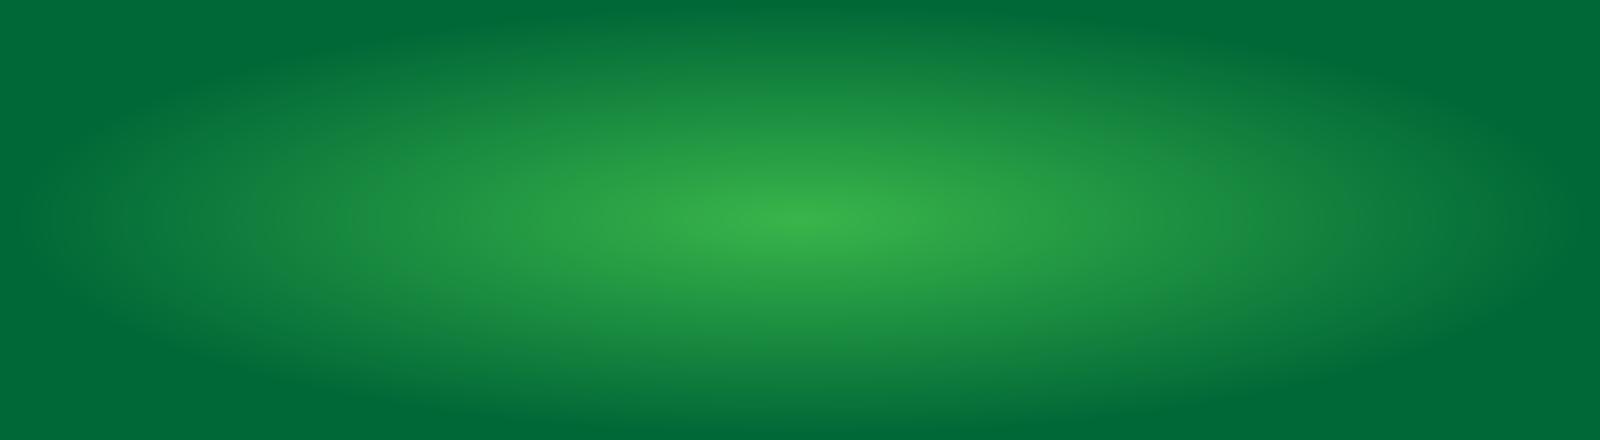 Banner fundo verde